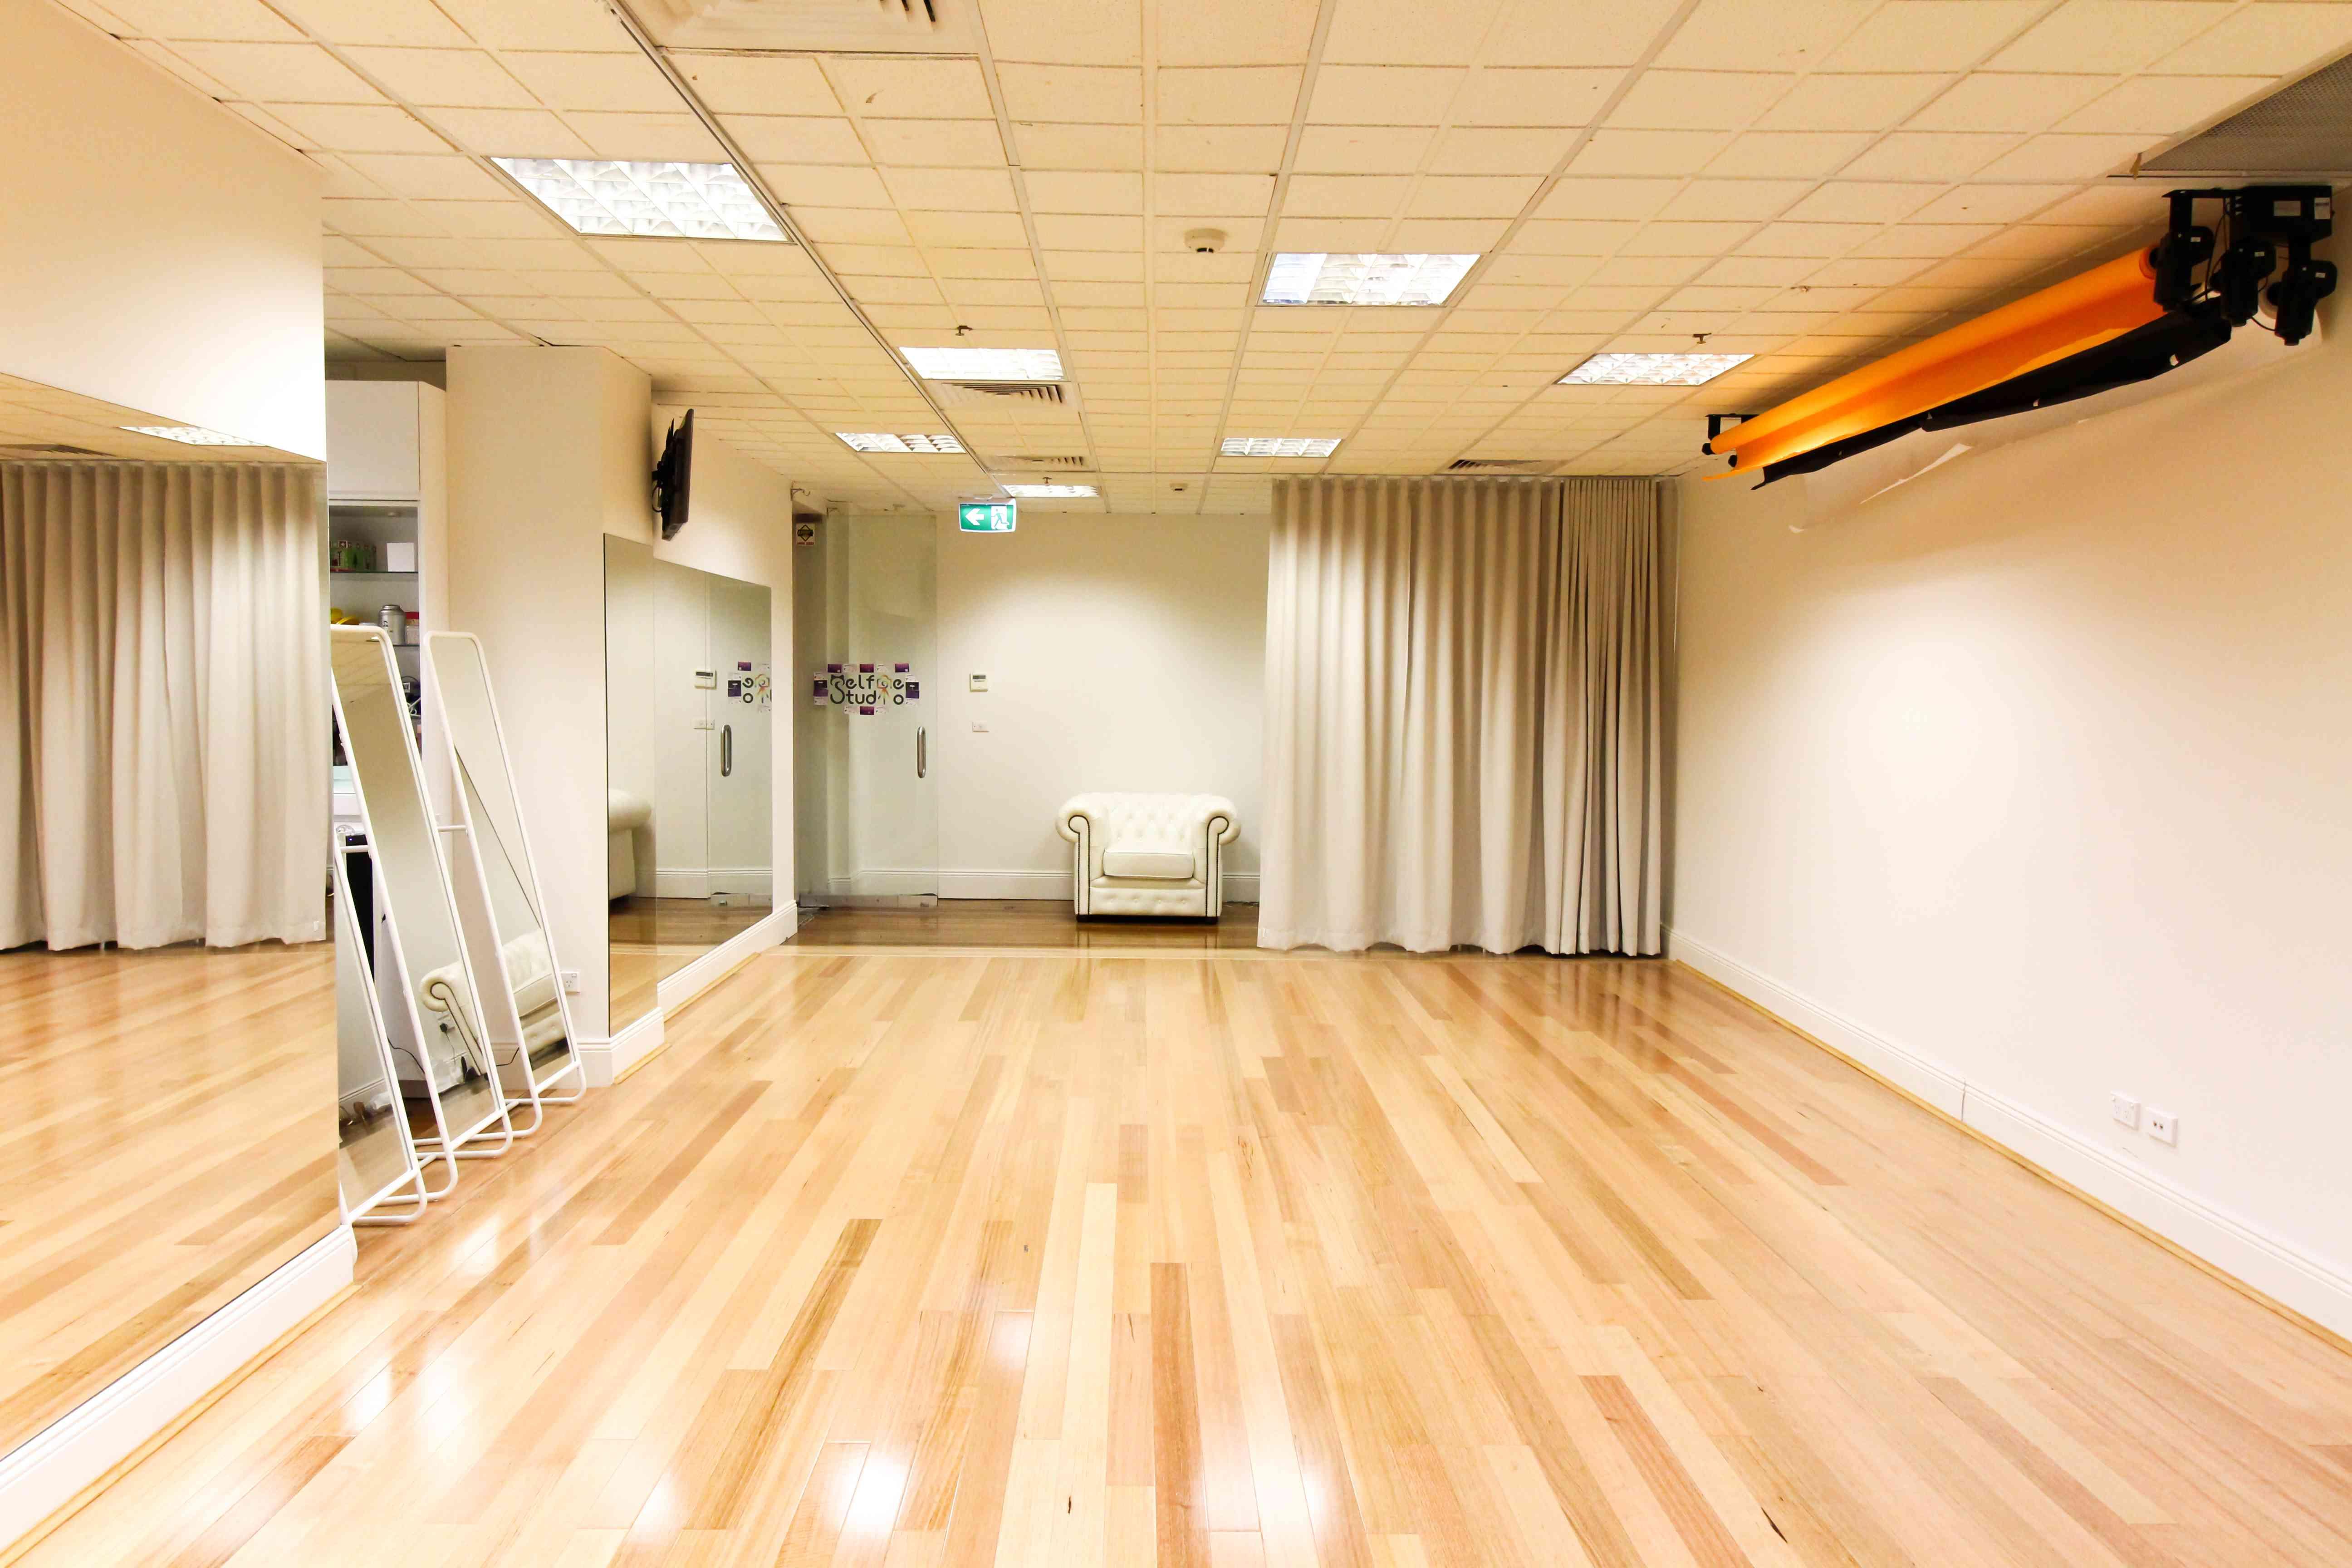 Photography Studio in Sydney CBD - Smarter Spaces